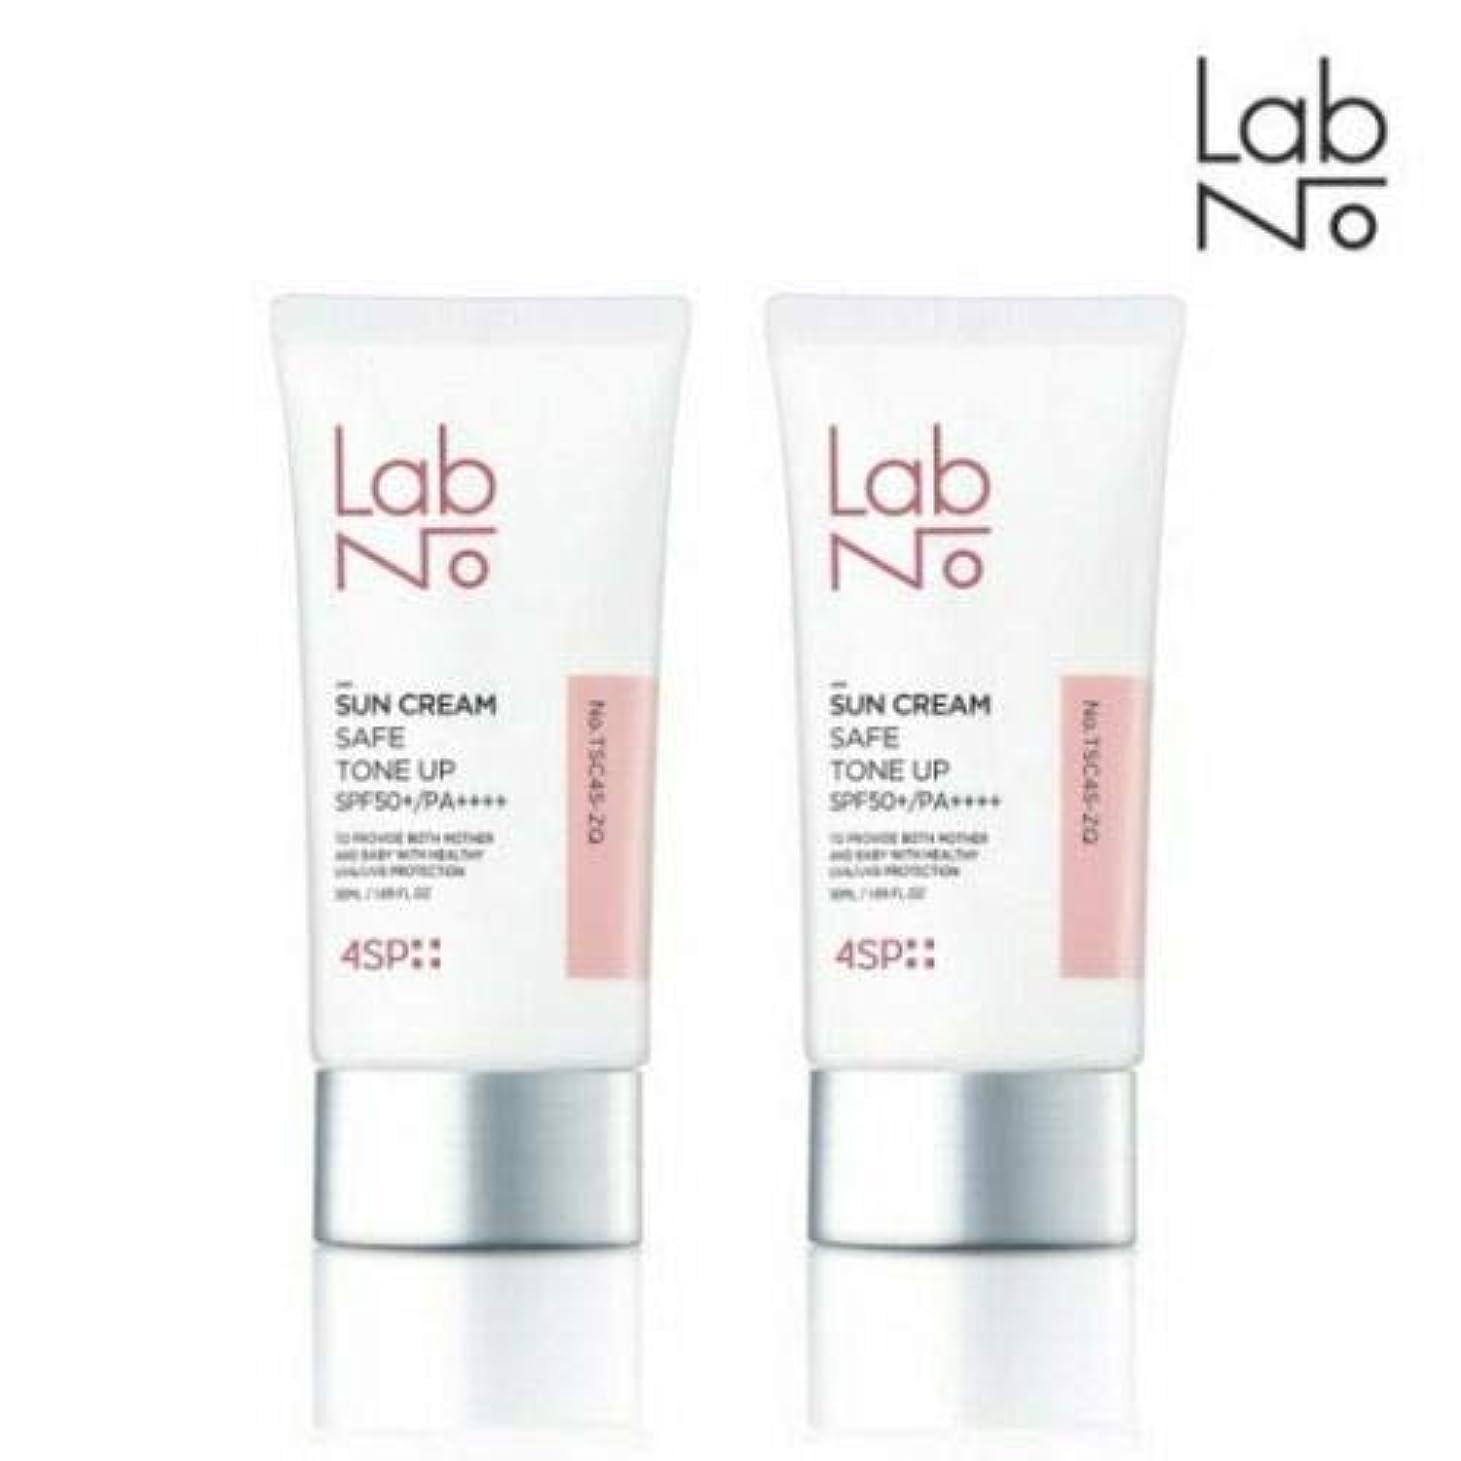 [1+1] LABNO セーフ トーンアップ サンクリーム 50ml SPF50+/PA++++ Safe Tone Up Sun Block Cream